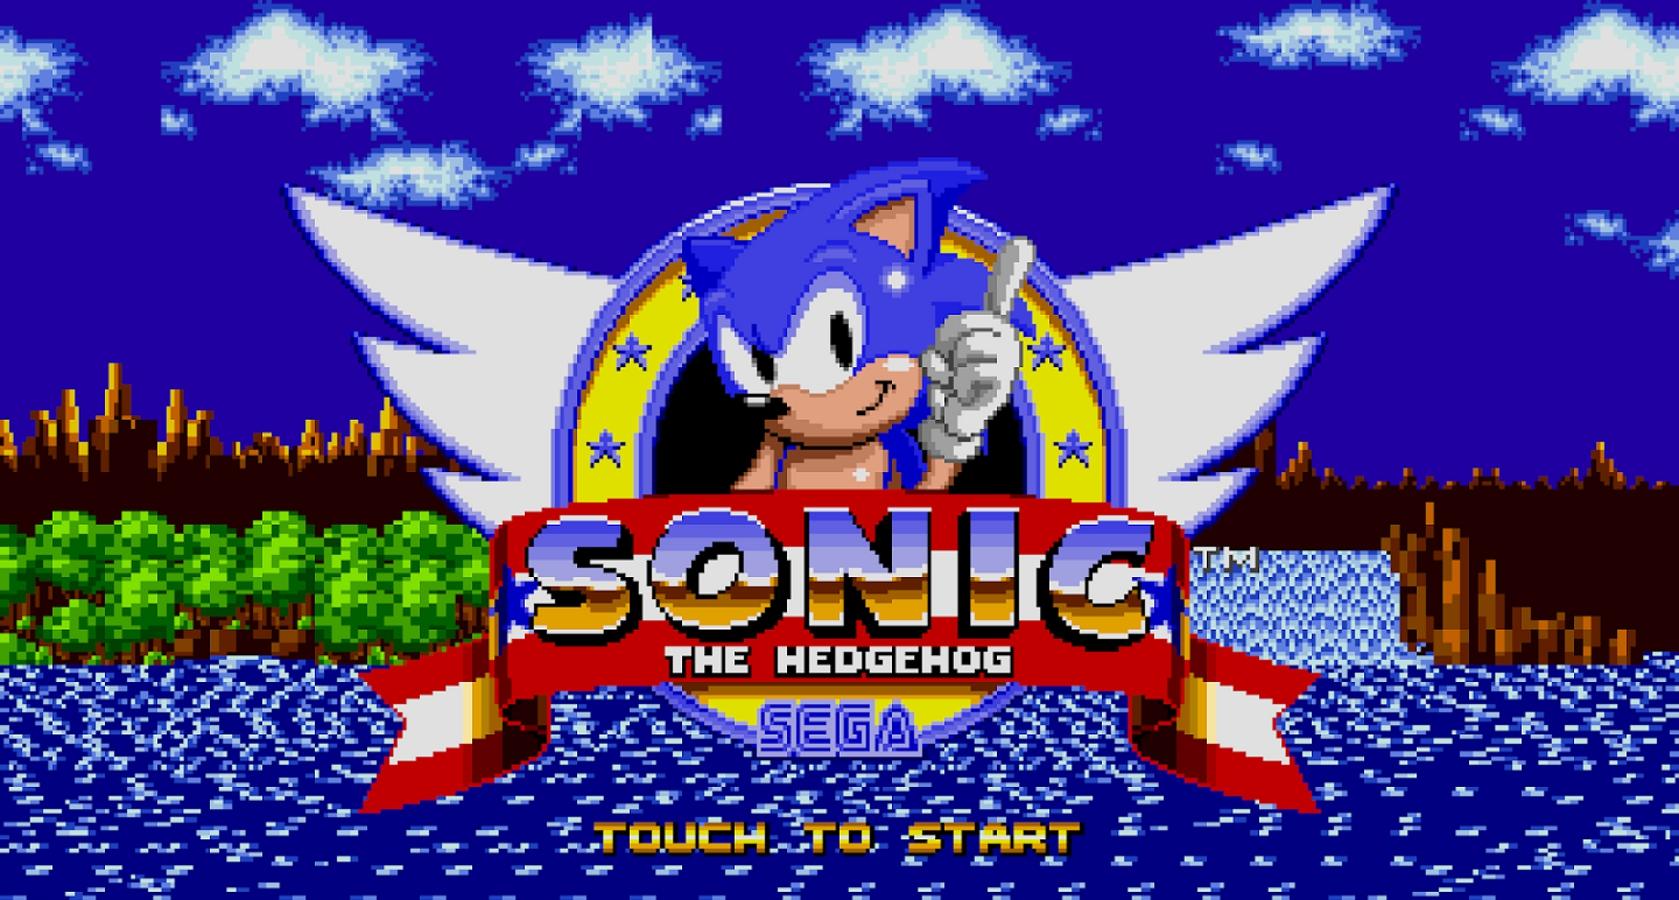 Allsonicgames Net one ring left: a retrospective of sonic the hedgehog